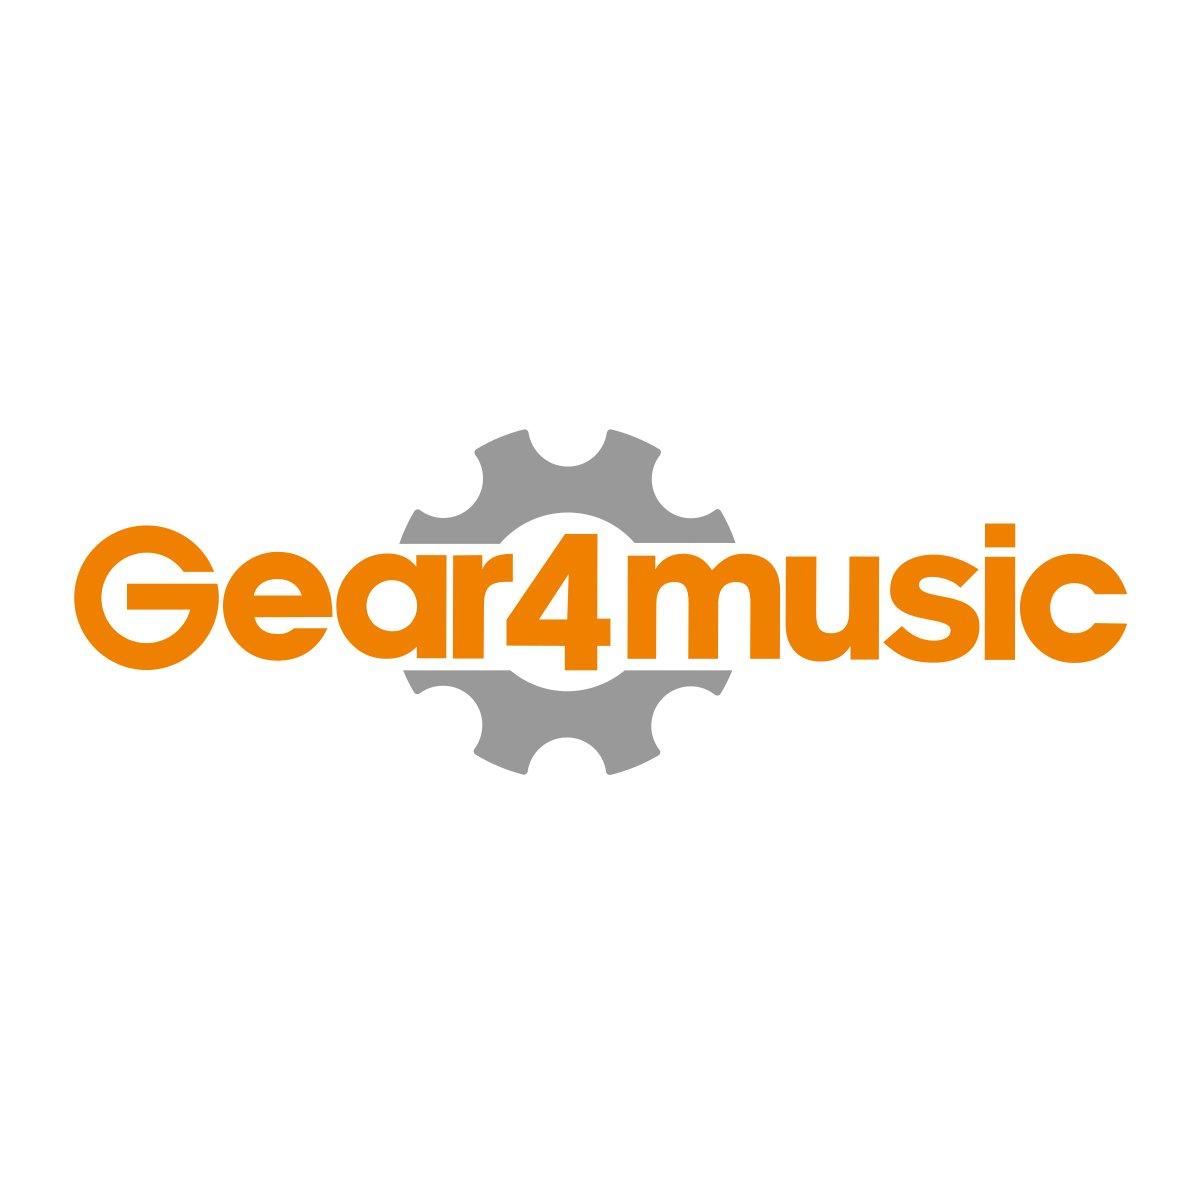 evans eq3 resonant smooth white bass drum head no port 24 inch at gear4music. Black Bedroom Furniture Sets. Home Design Ideas